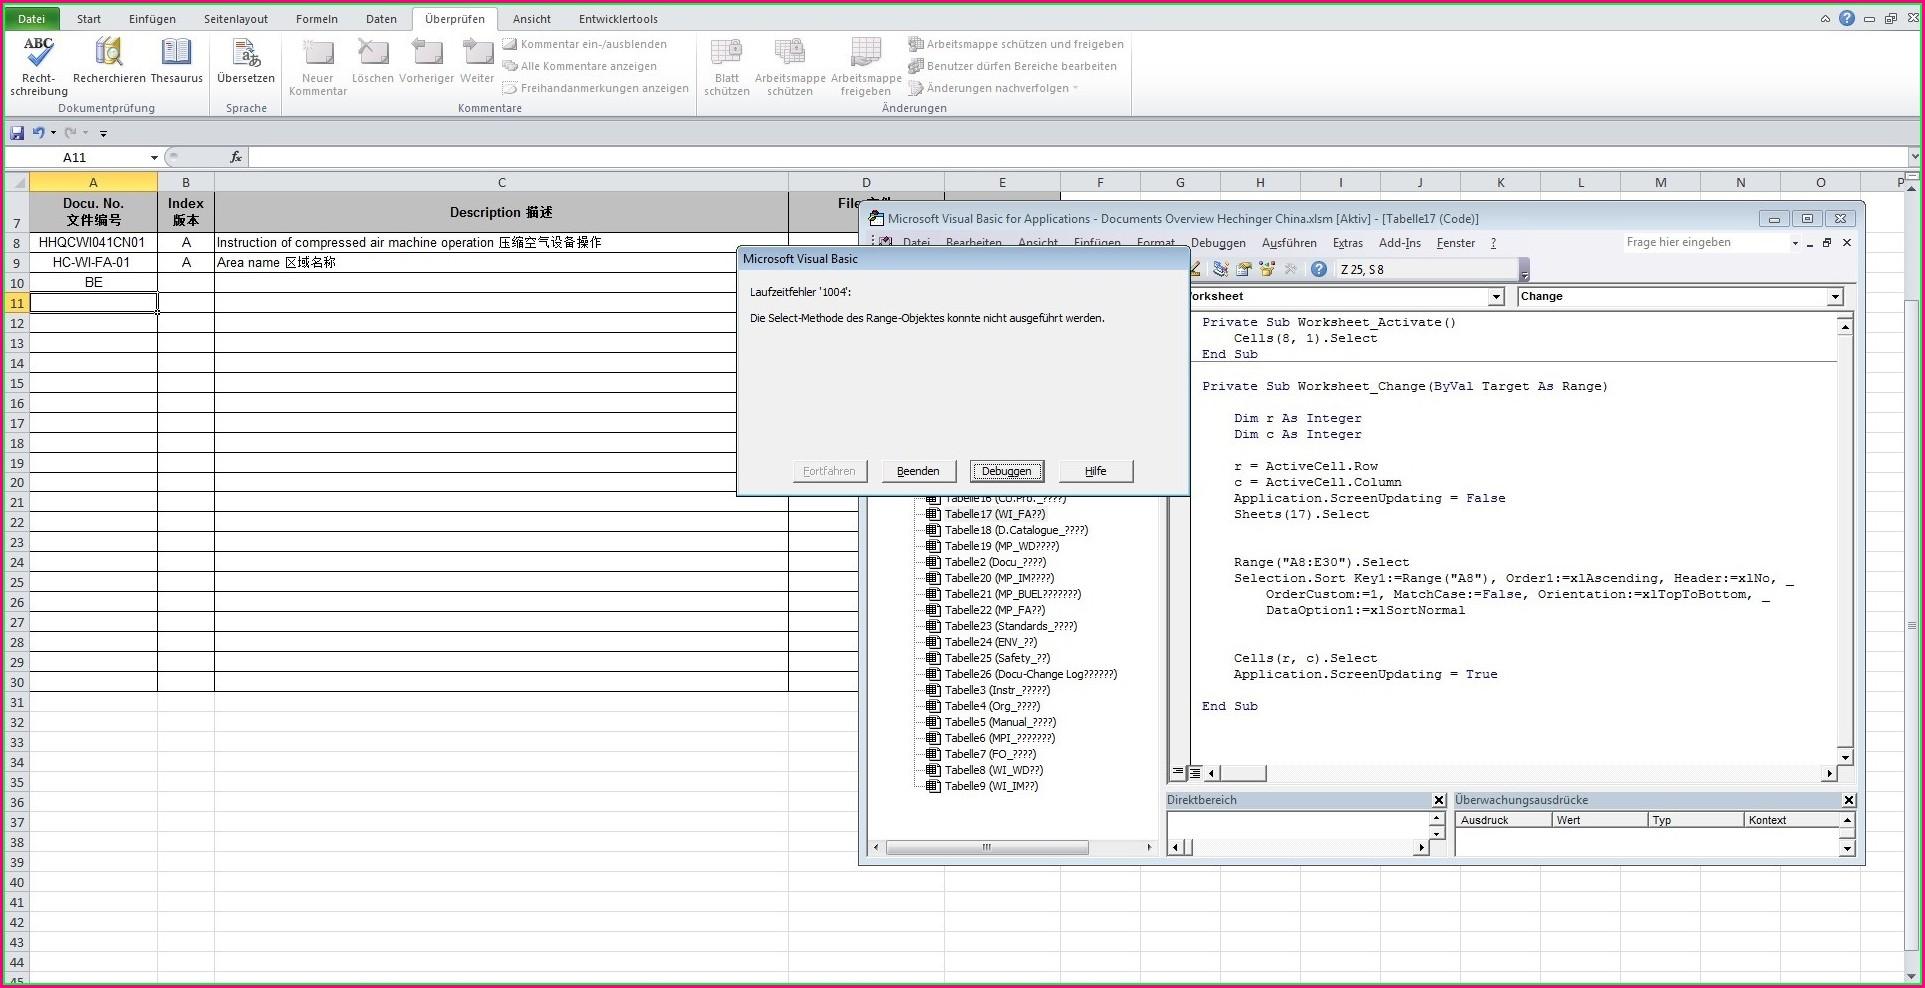 Excel Vba Sort Type